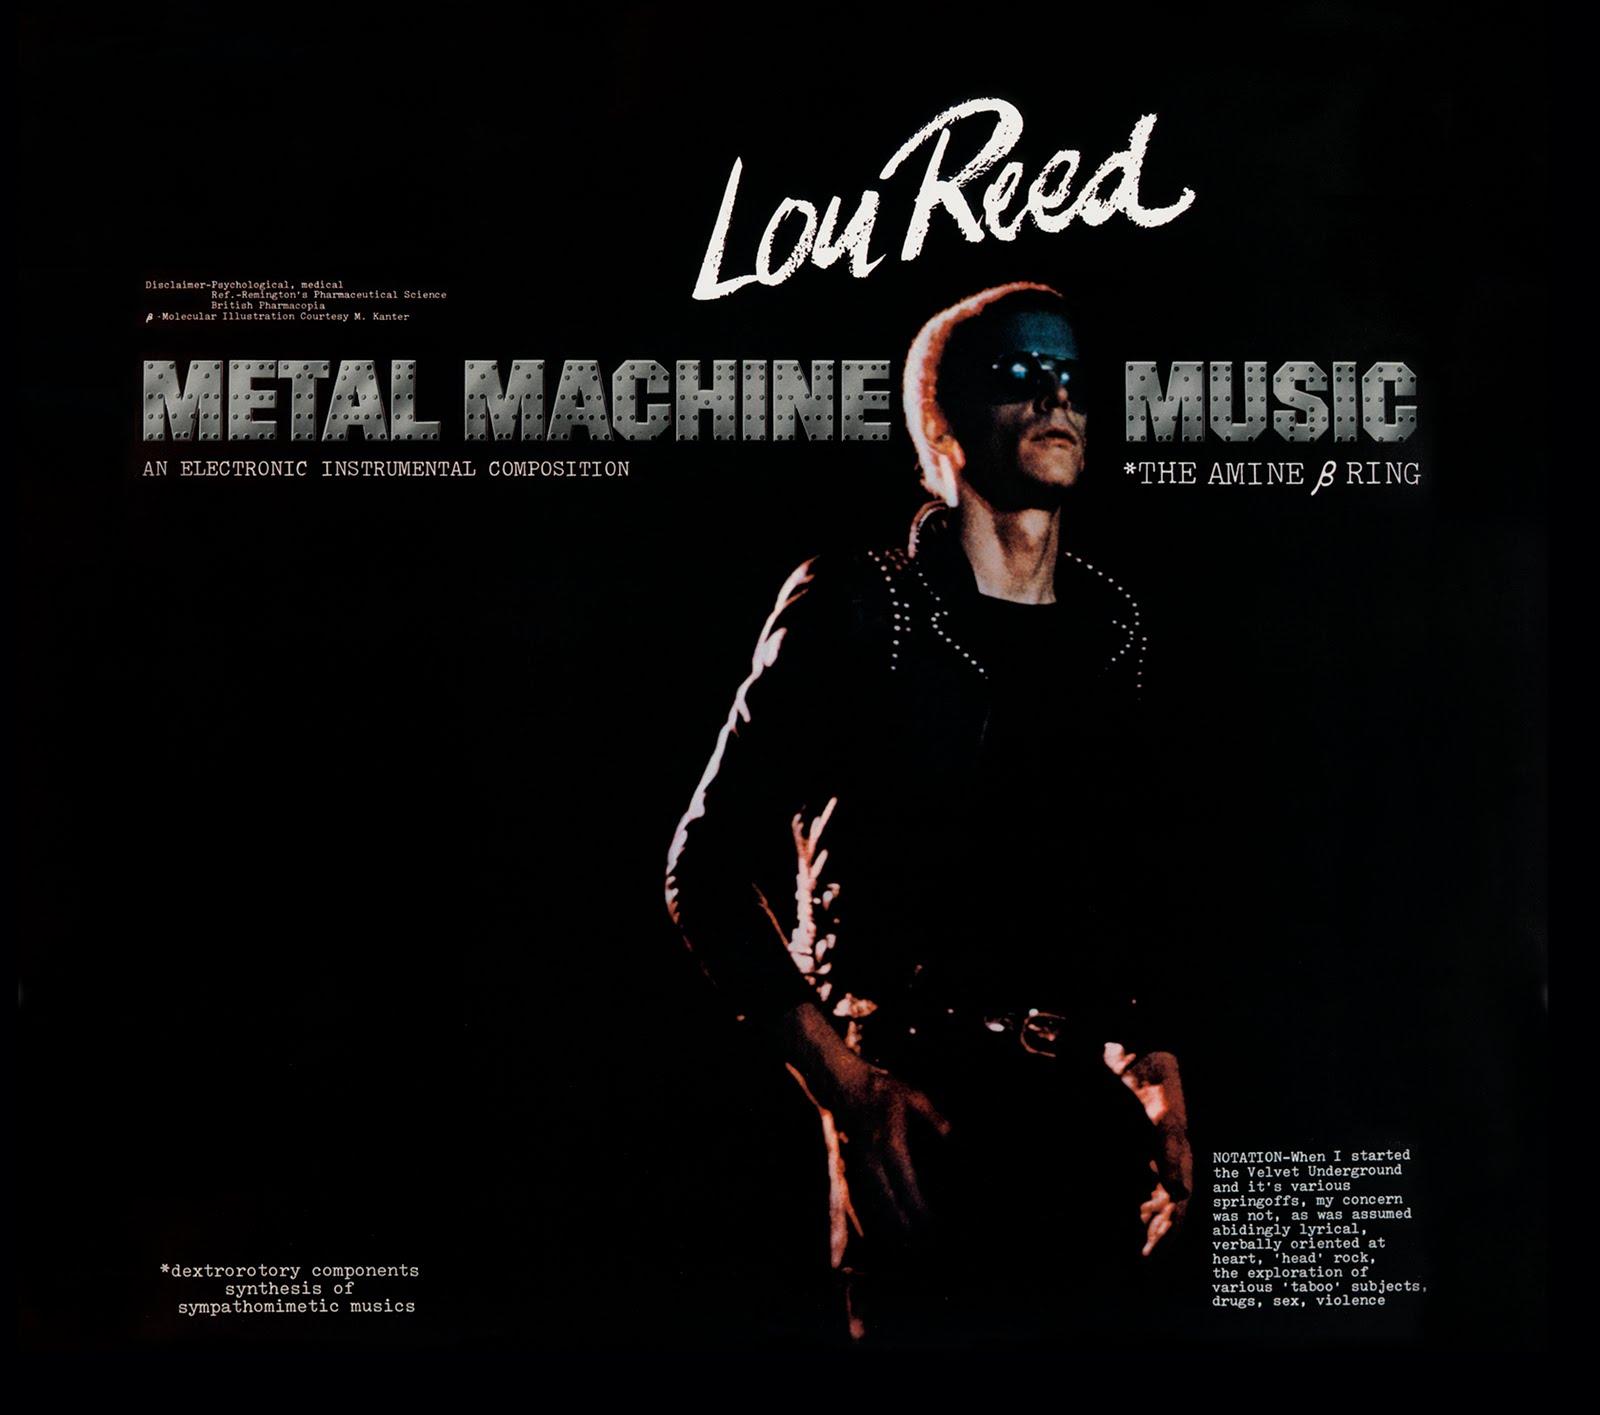 http://3.bp.blogspot.com/_7rKMdCJVIlI/TVAmkWqrMhI/AAAAAAAAARc/jhzL730nzb8/s1600/metalmachine.jpg